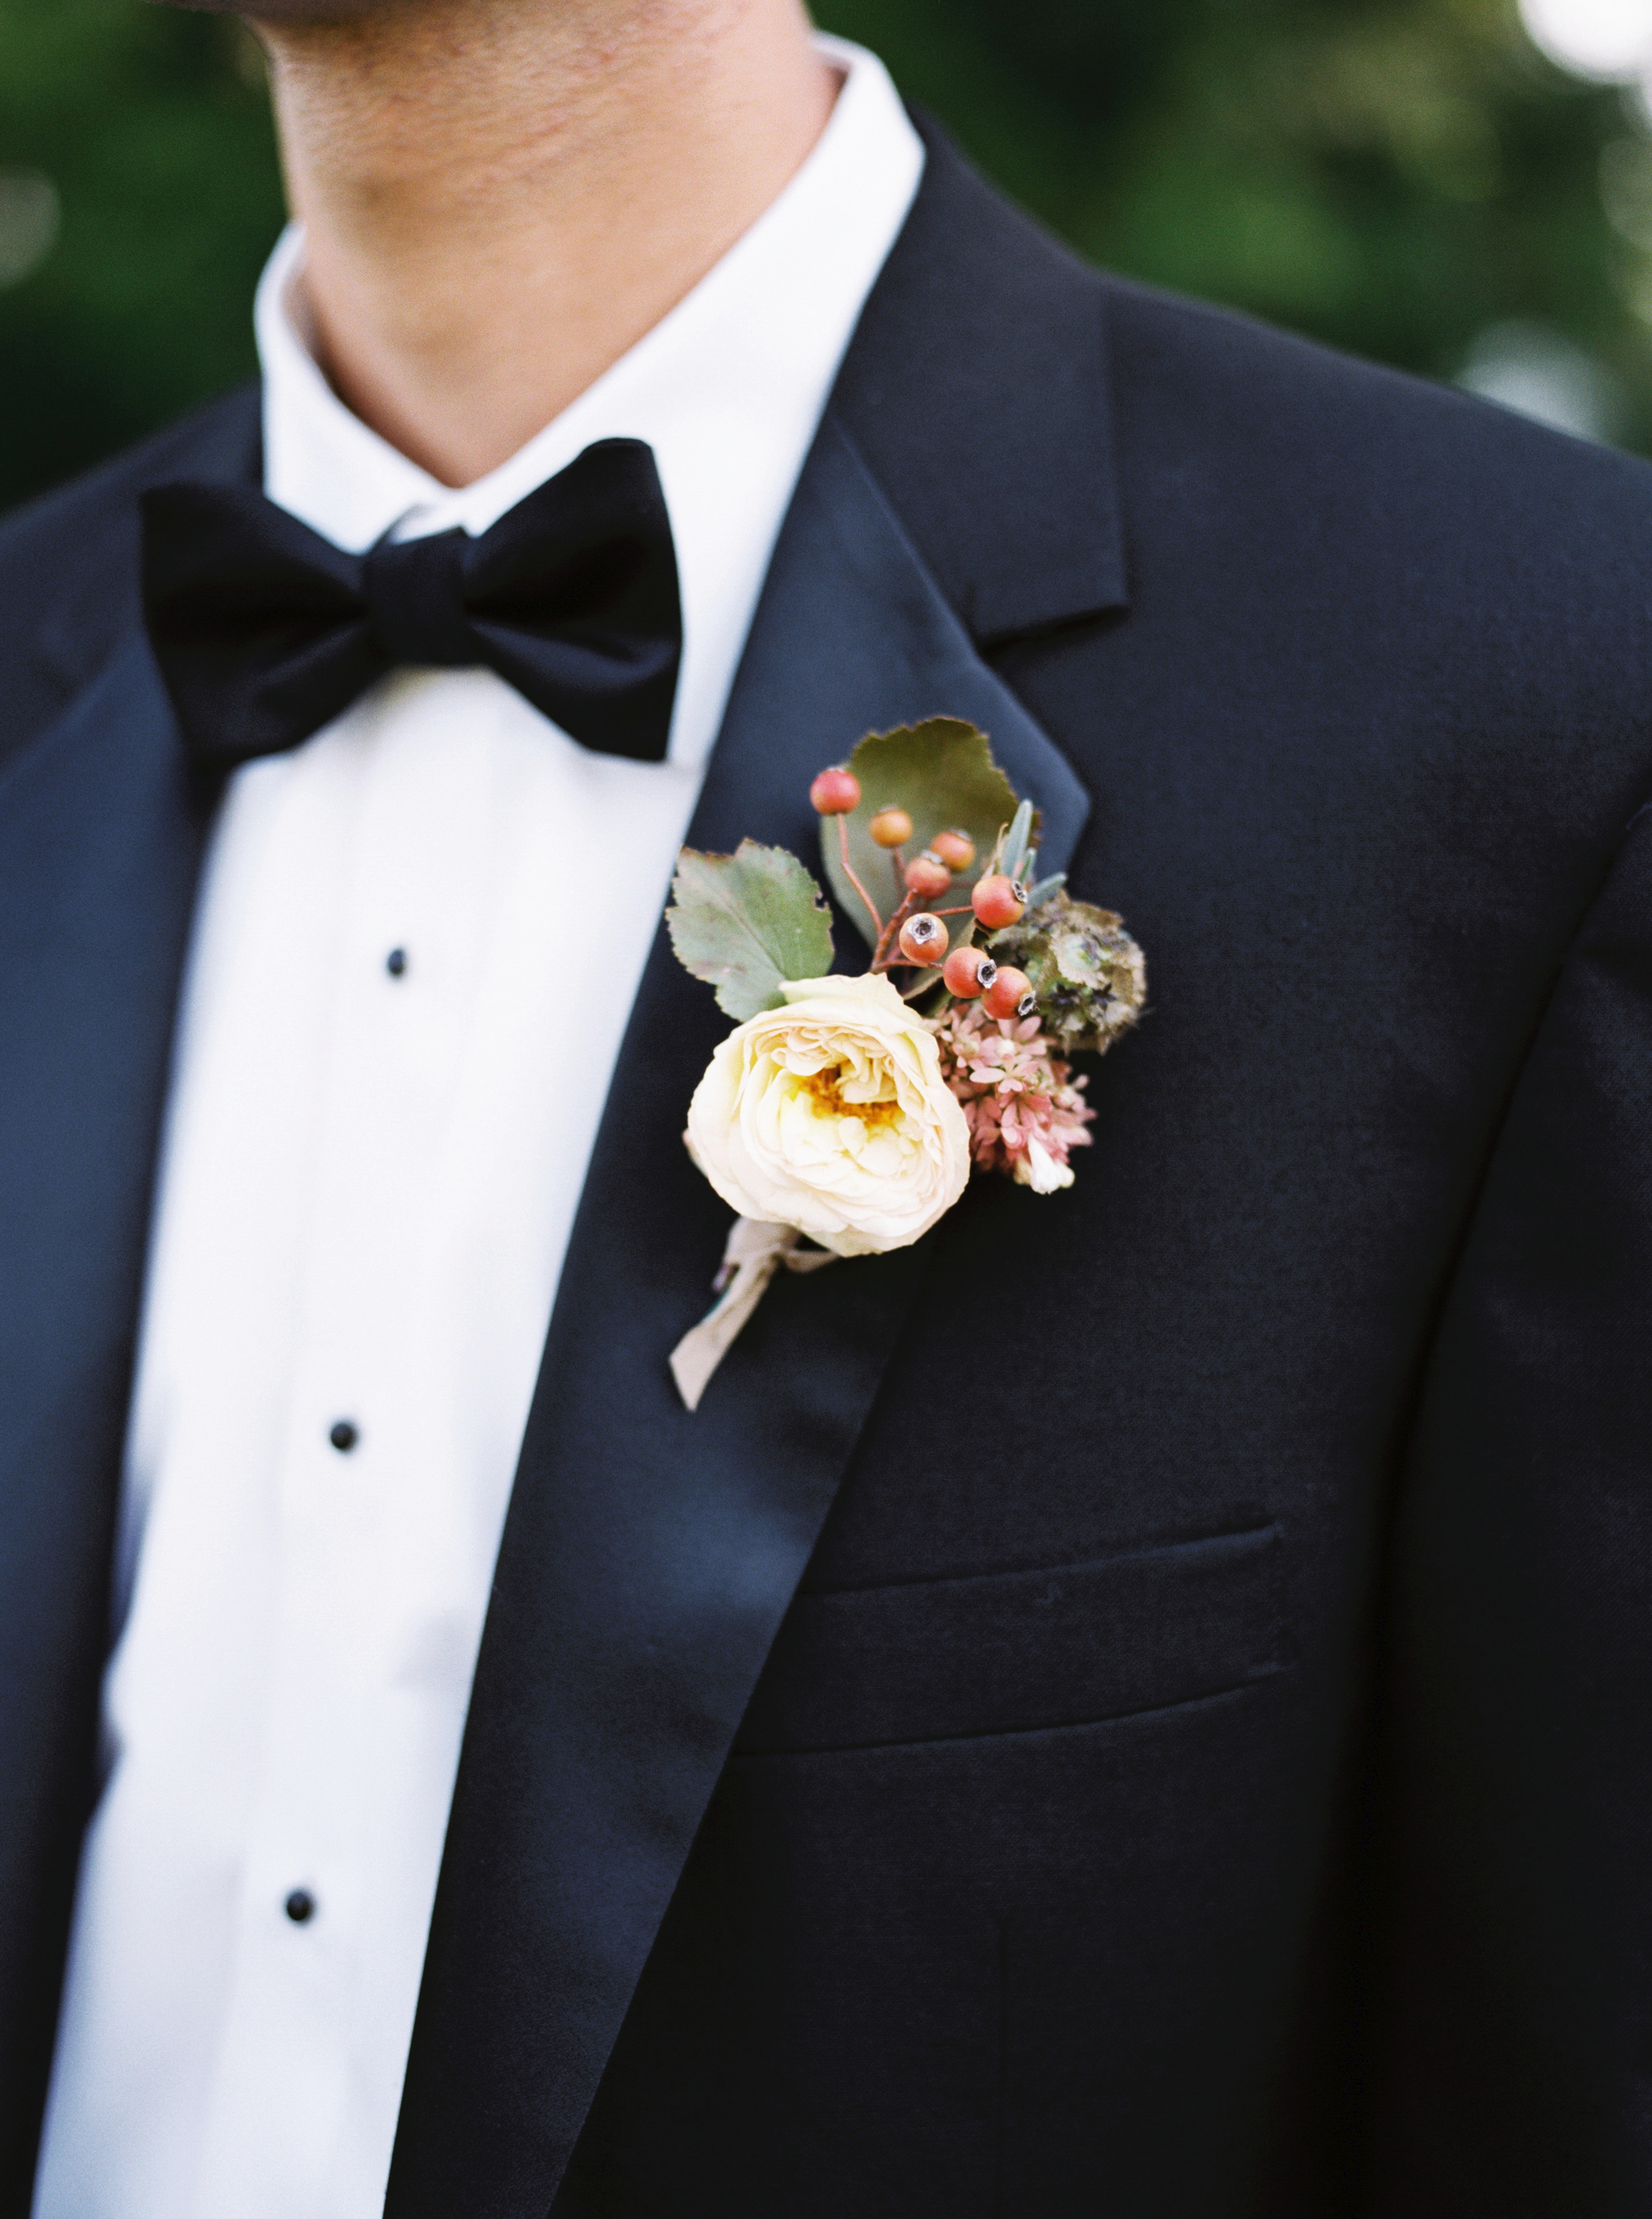 amanda william wedding tennessee boutonniere